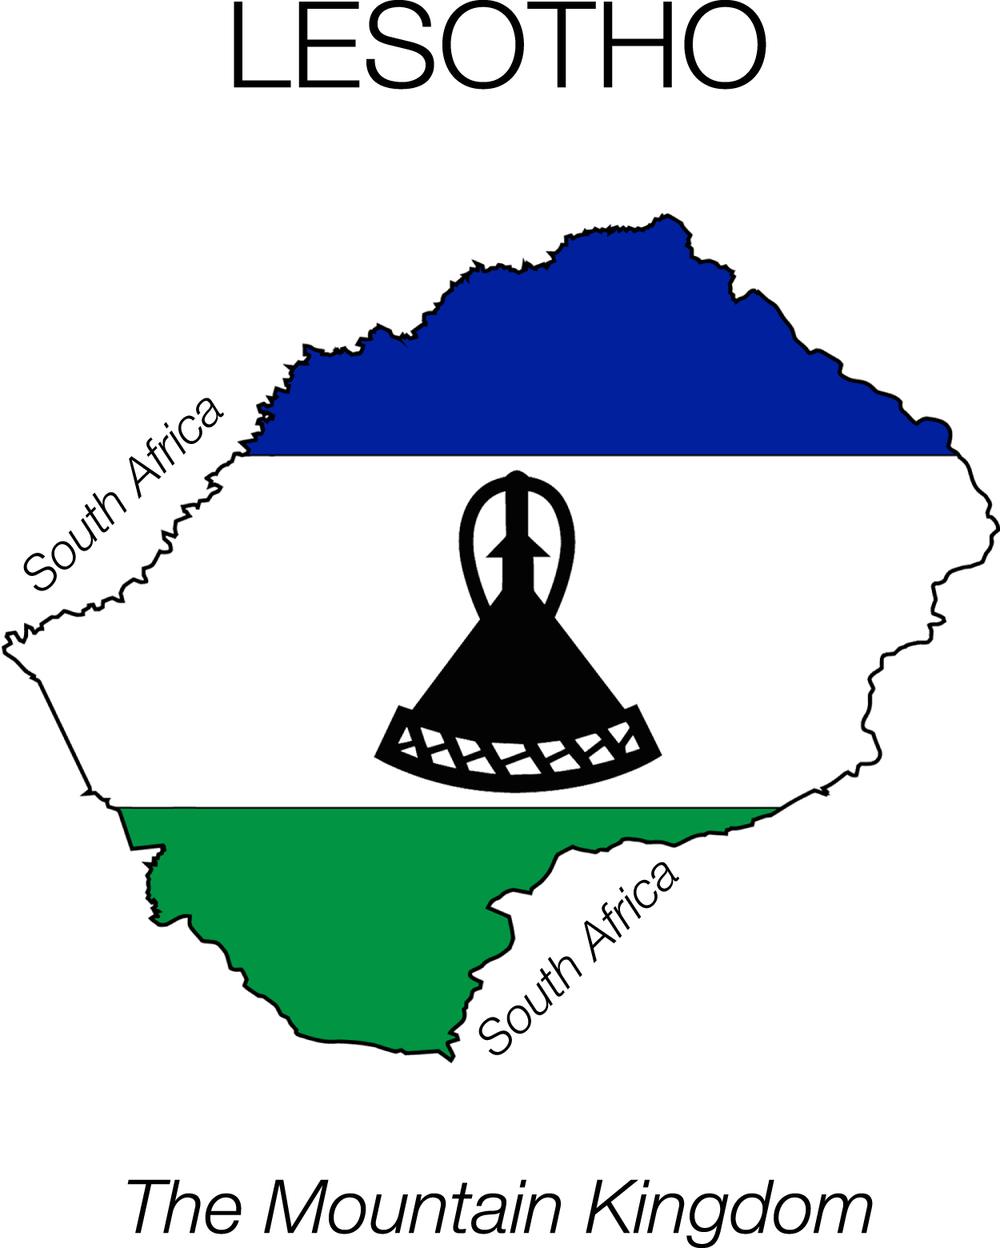 MK_Map Lesotho Web.jpg